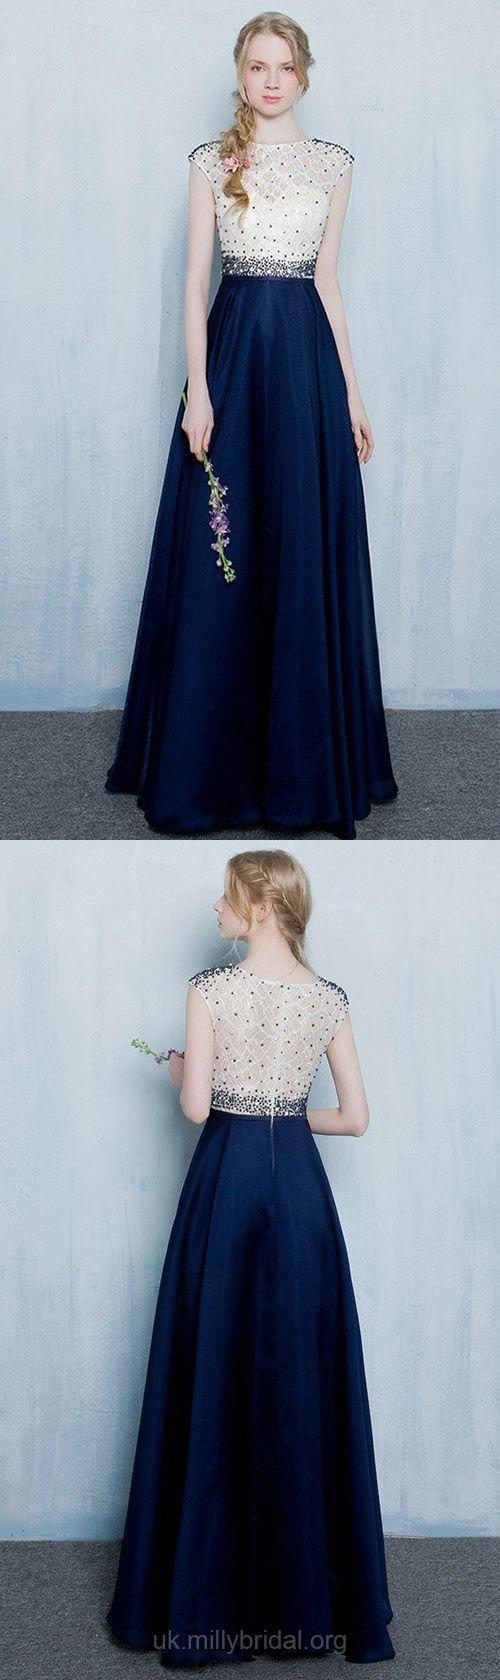 Dark navy prom dresses long classy formal dresses for teens aline